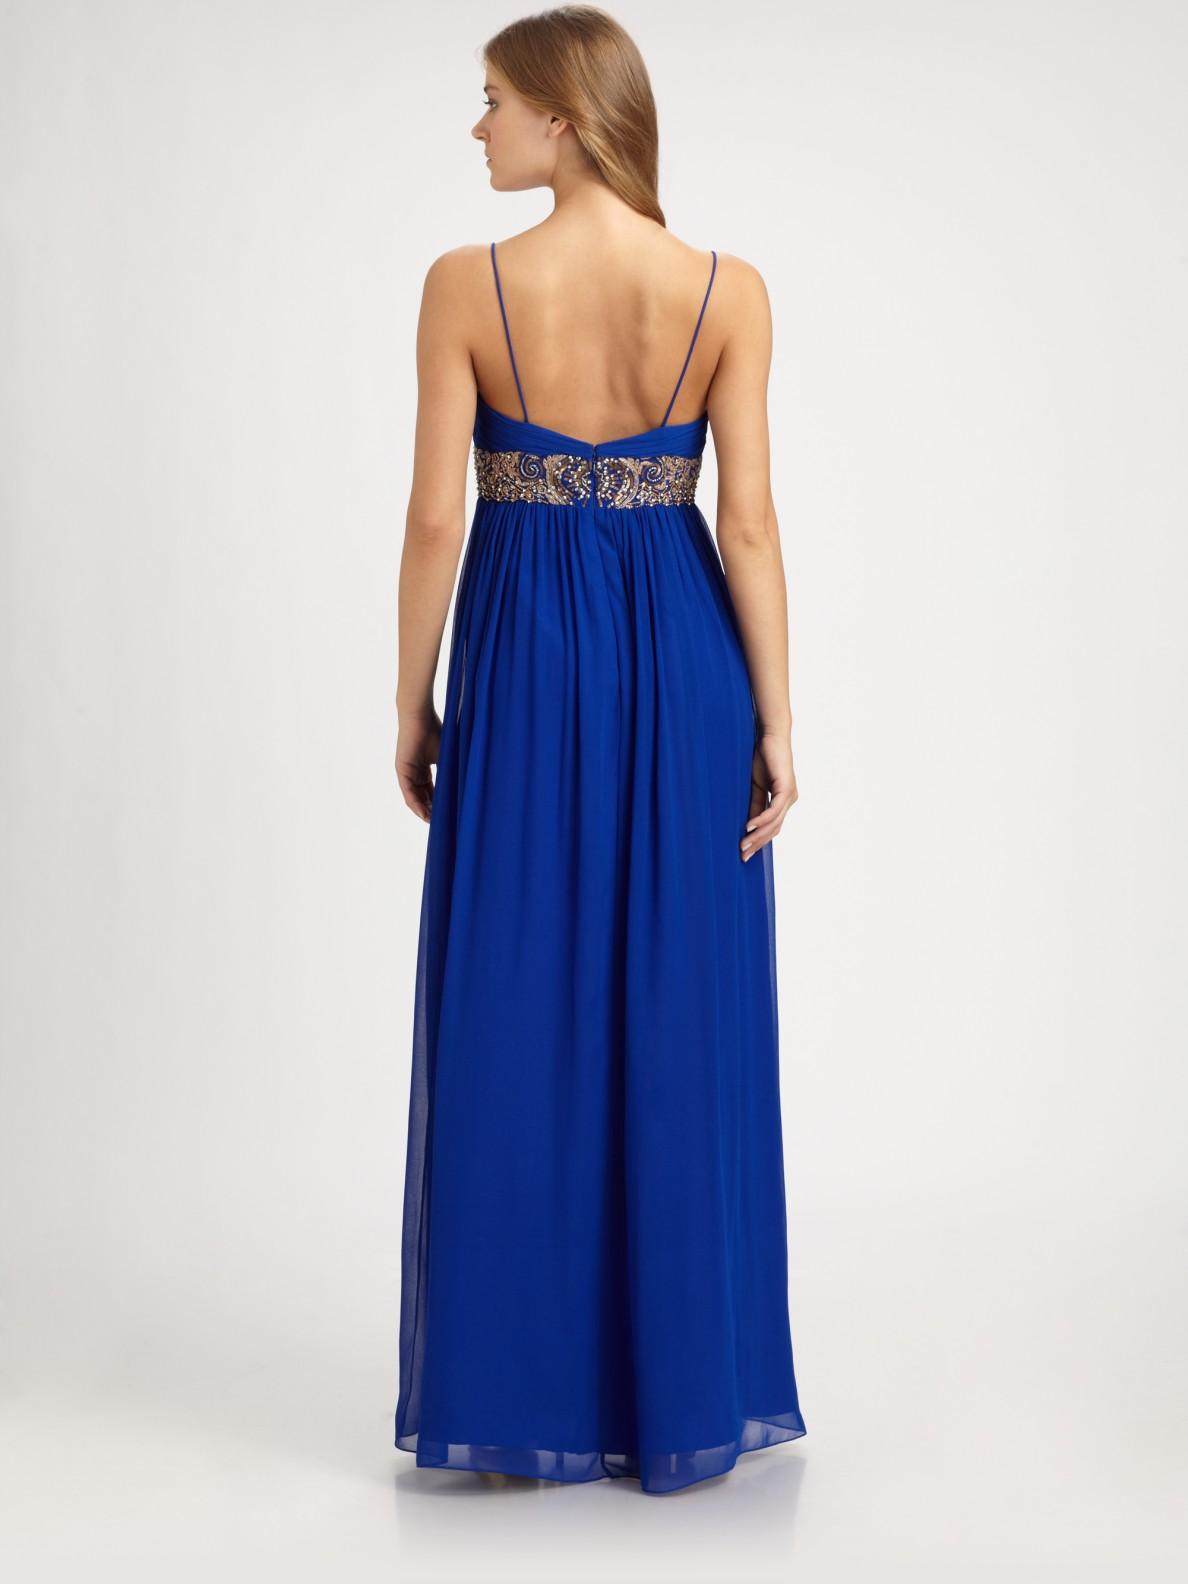 Aidan mattox Chiffon Gown in Blue | Lyst